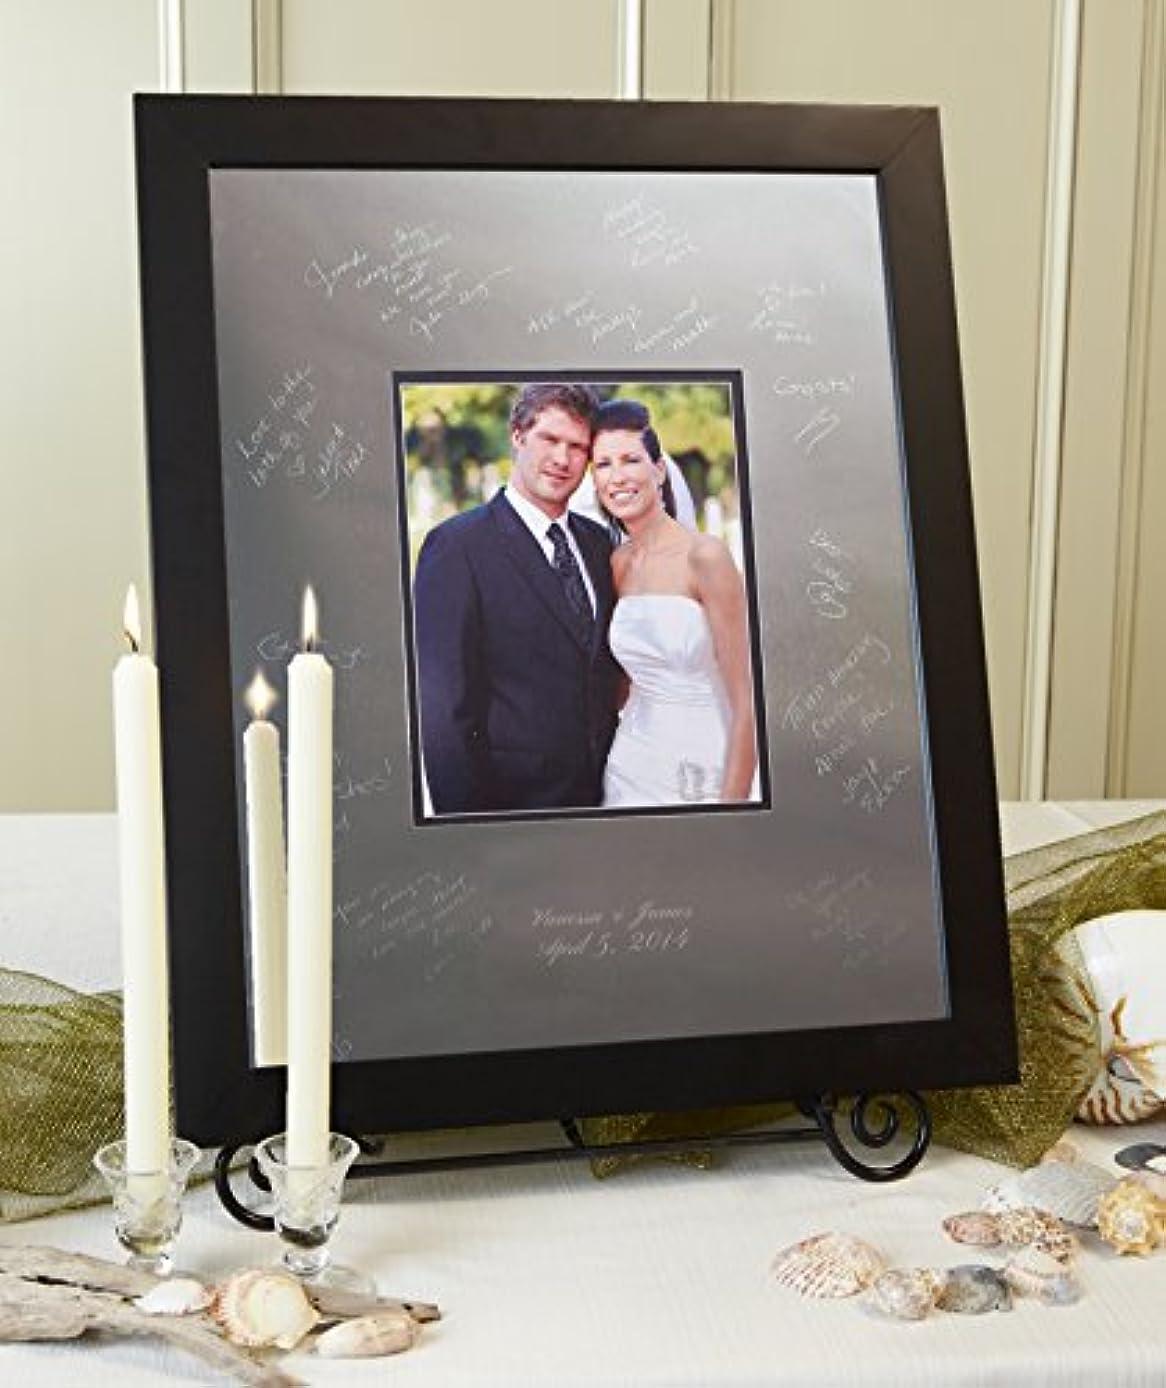 Signature Keepsakes Frame Engravable Signature Mat Guest Book, Large, Silver/Black